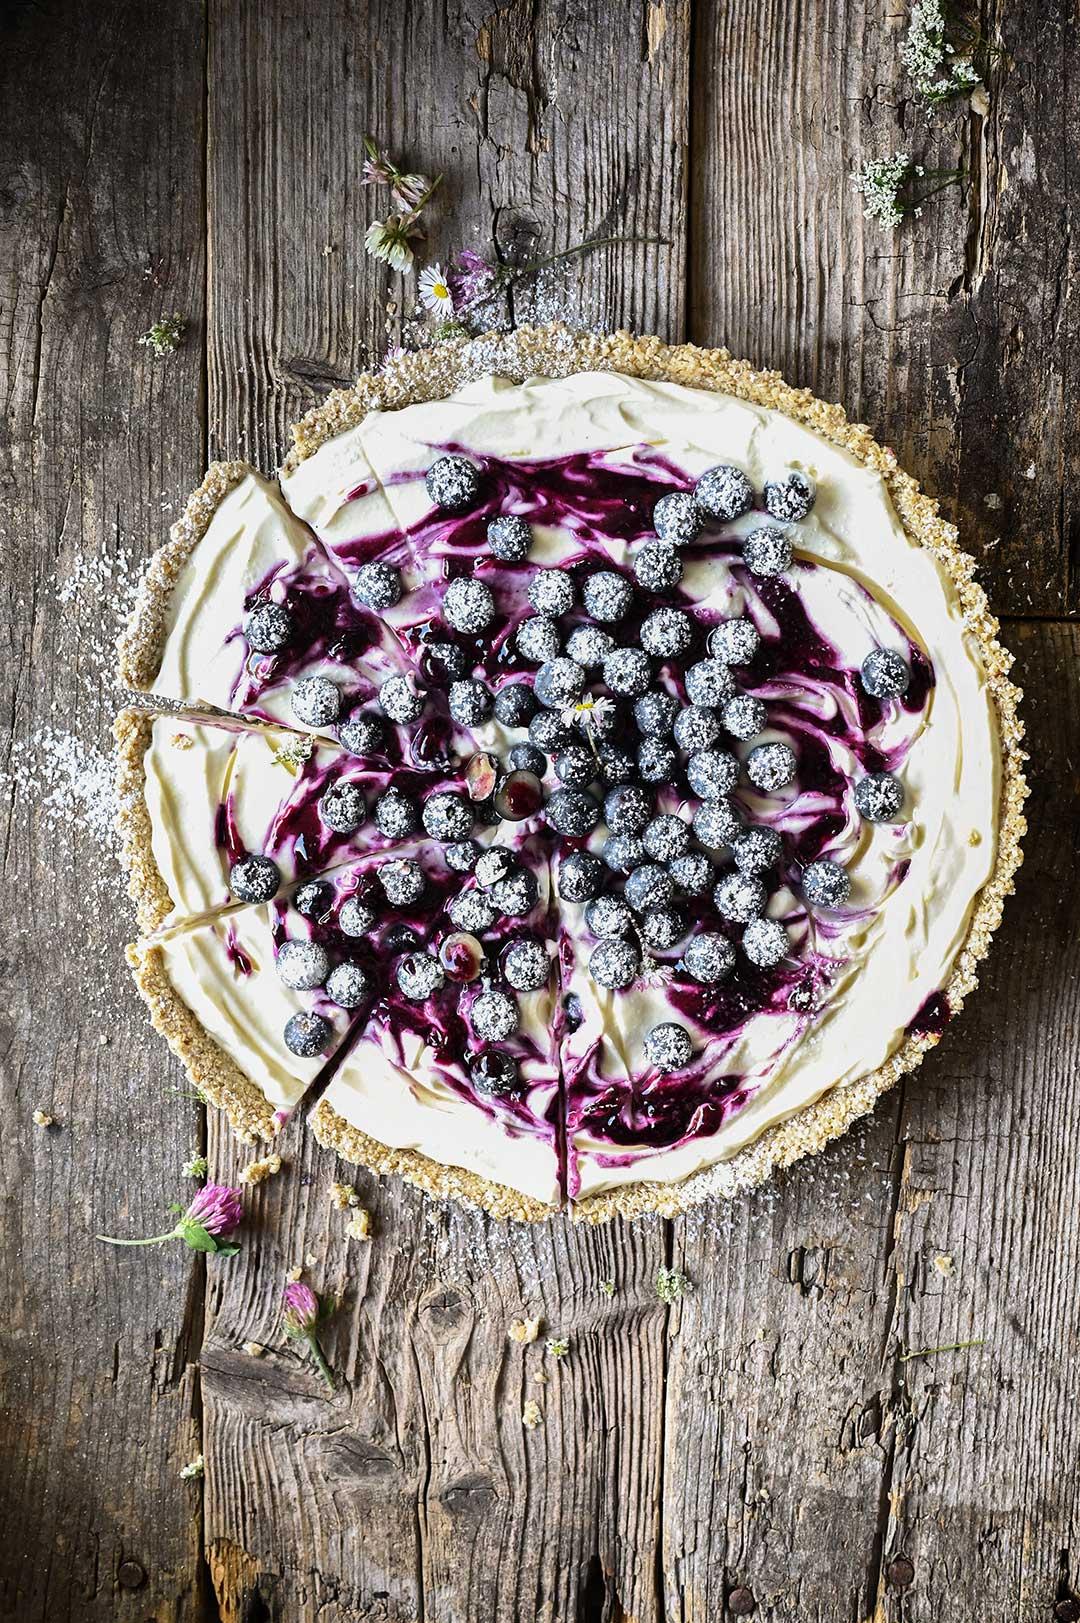 serving dumplings | No-bake blueberry cheesecake